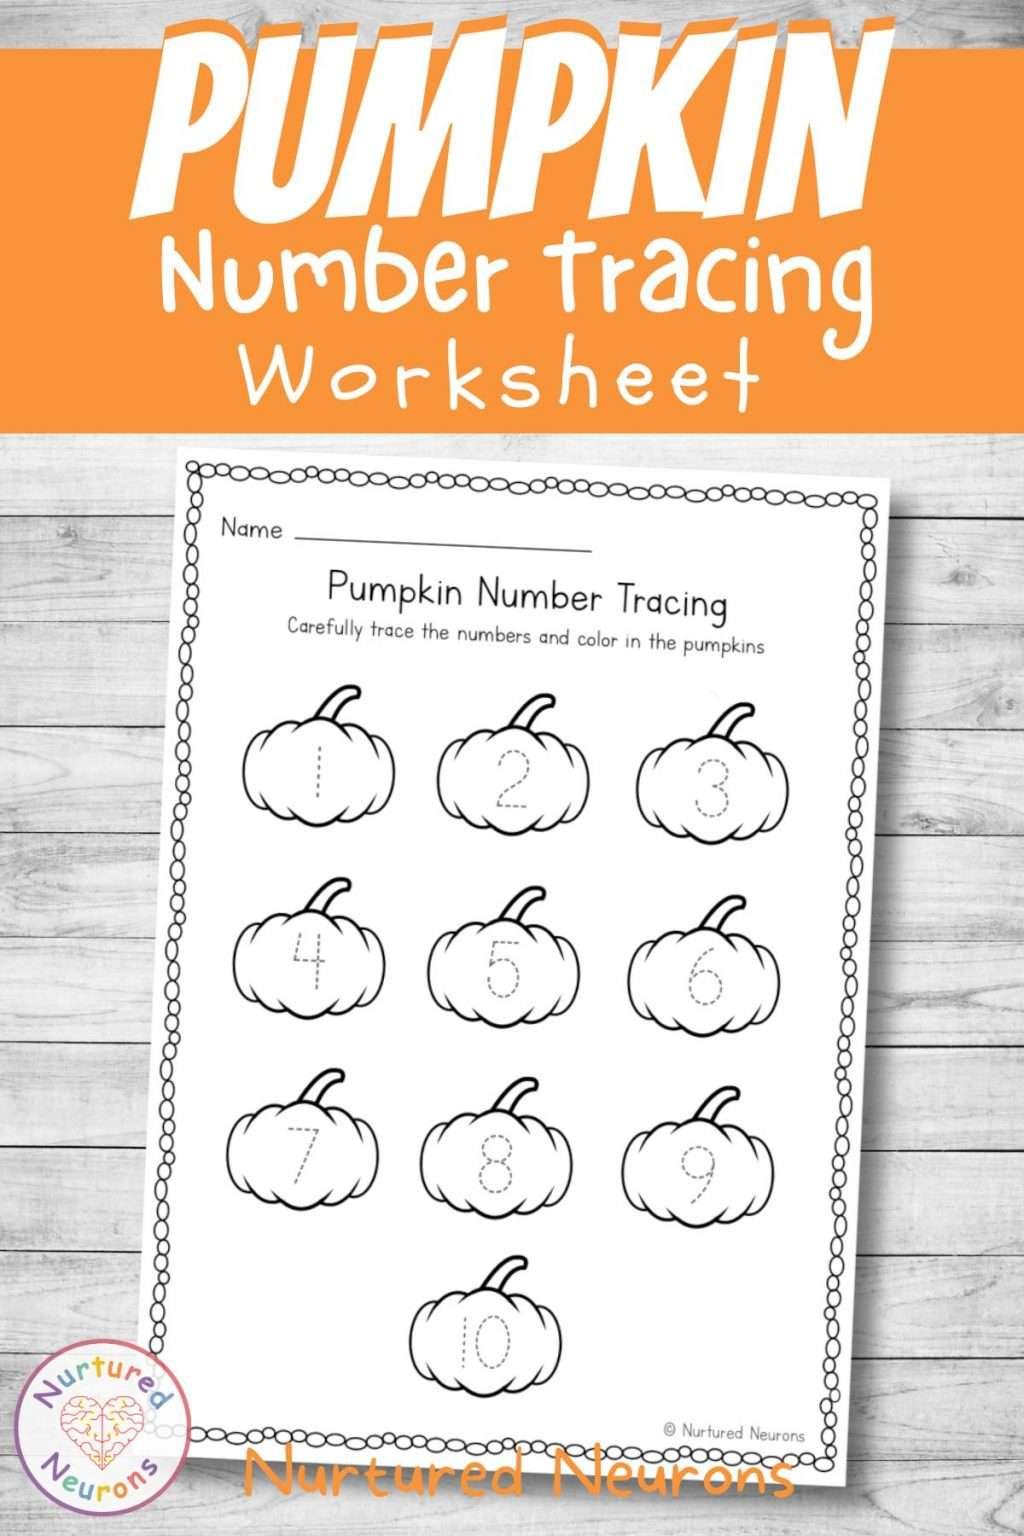 Halloween number tracing worksheet for preschool 1-10